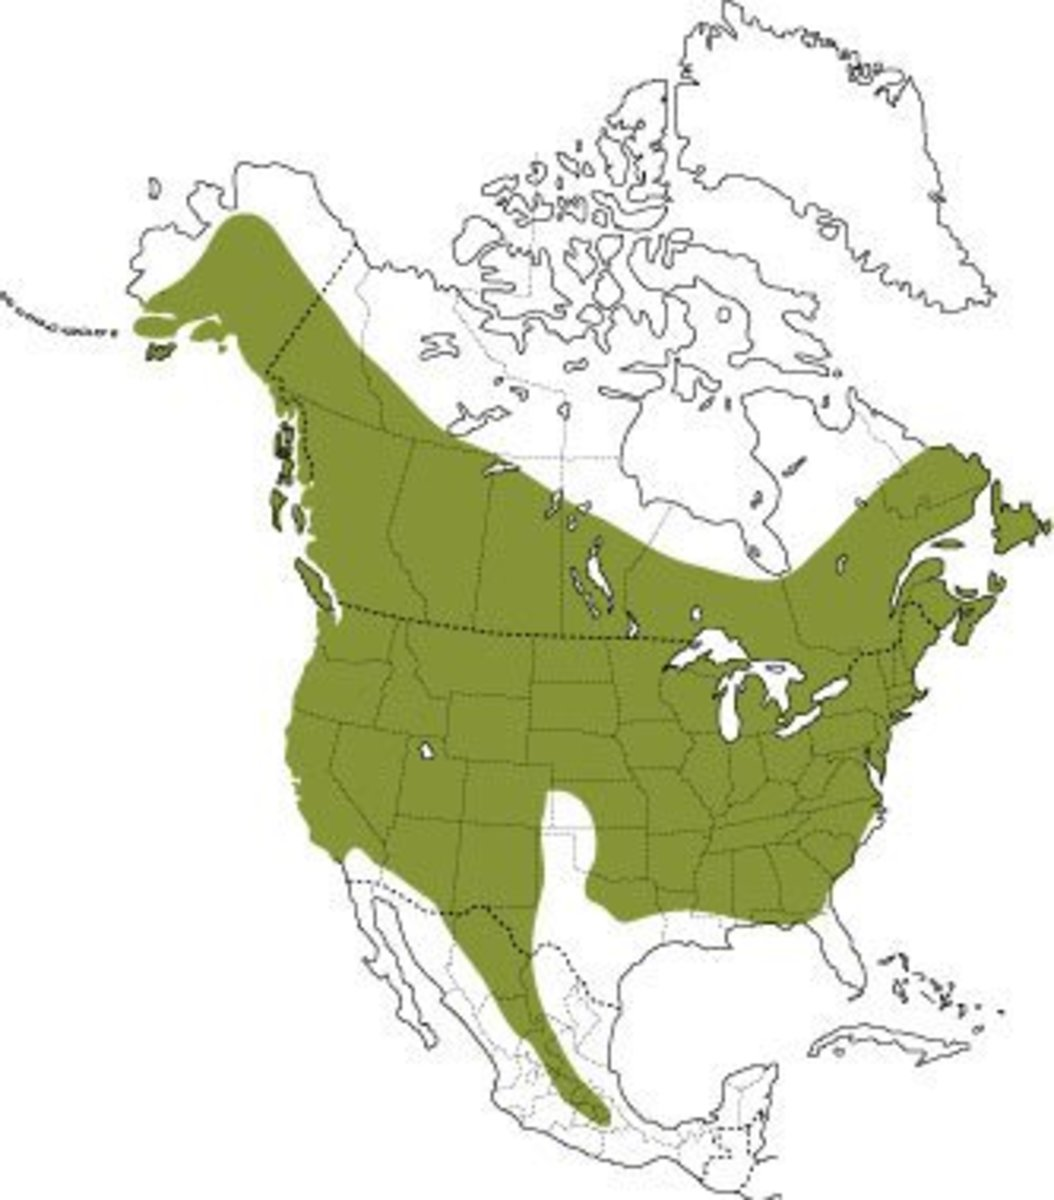 Where Bats Occur In North America